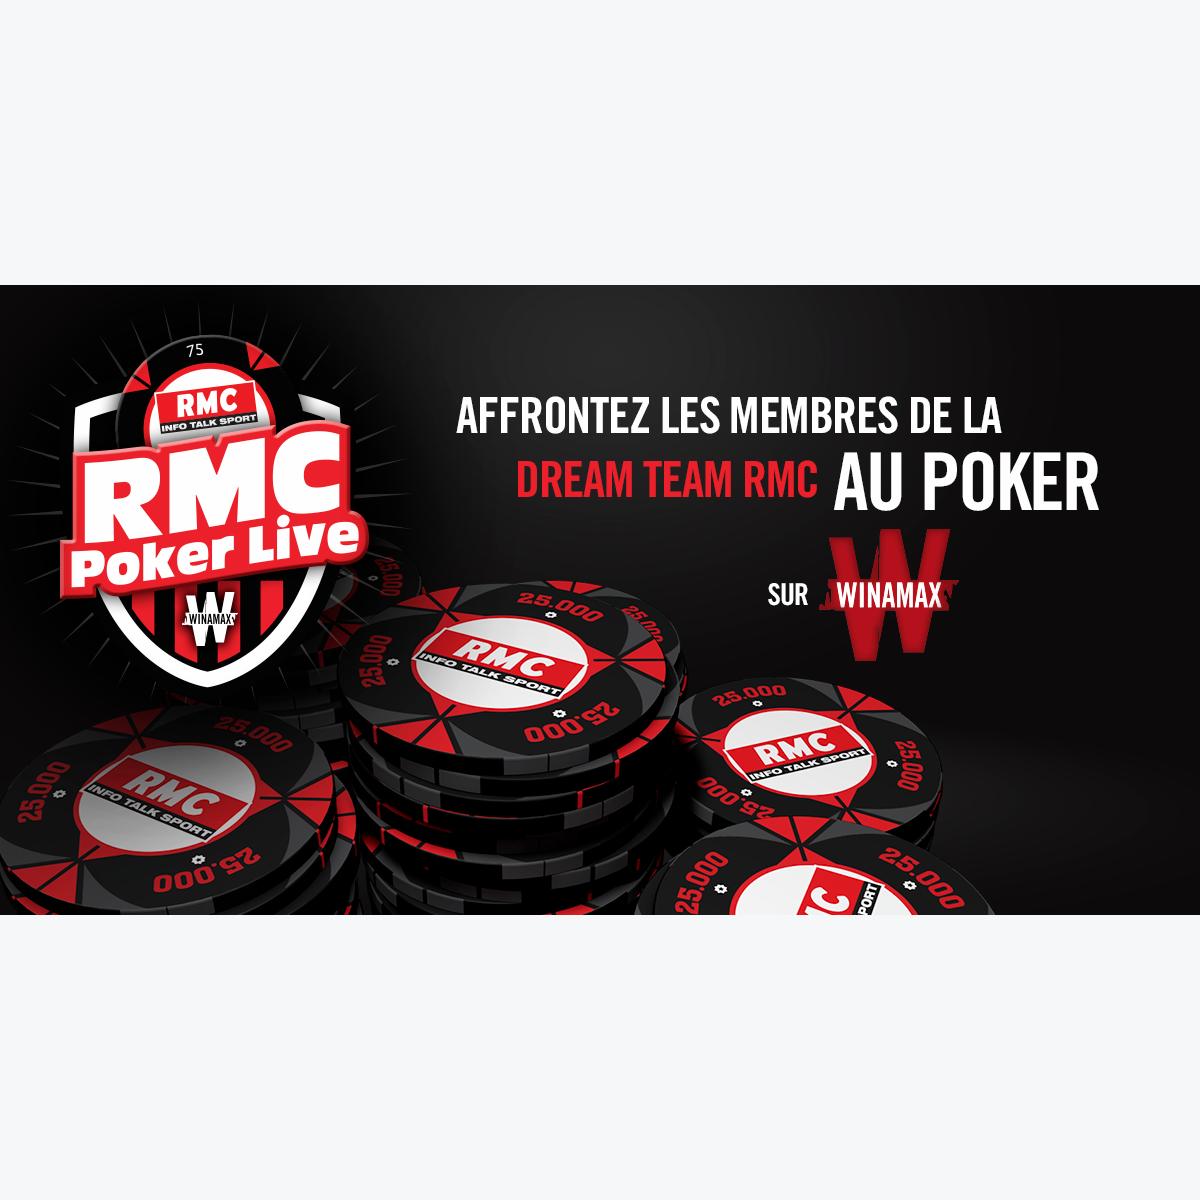 Rmc poker riolo